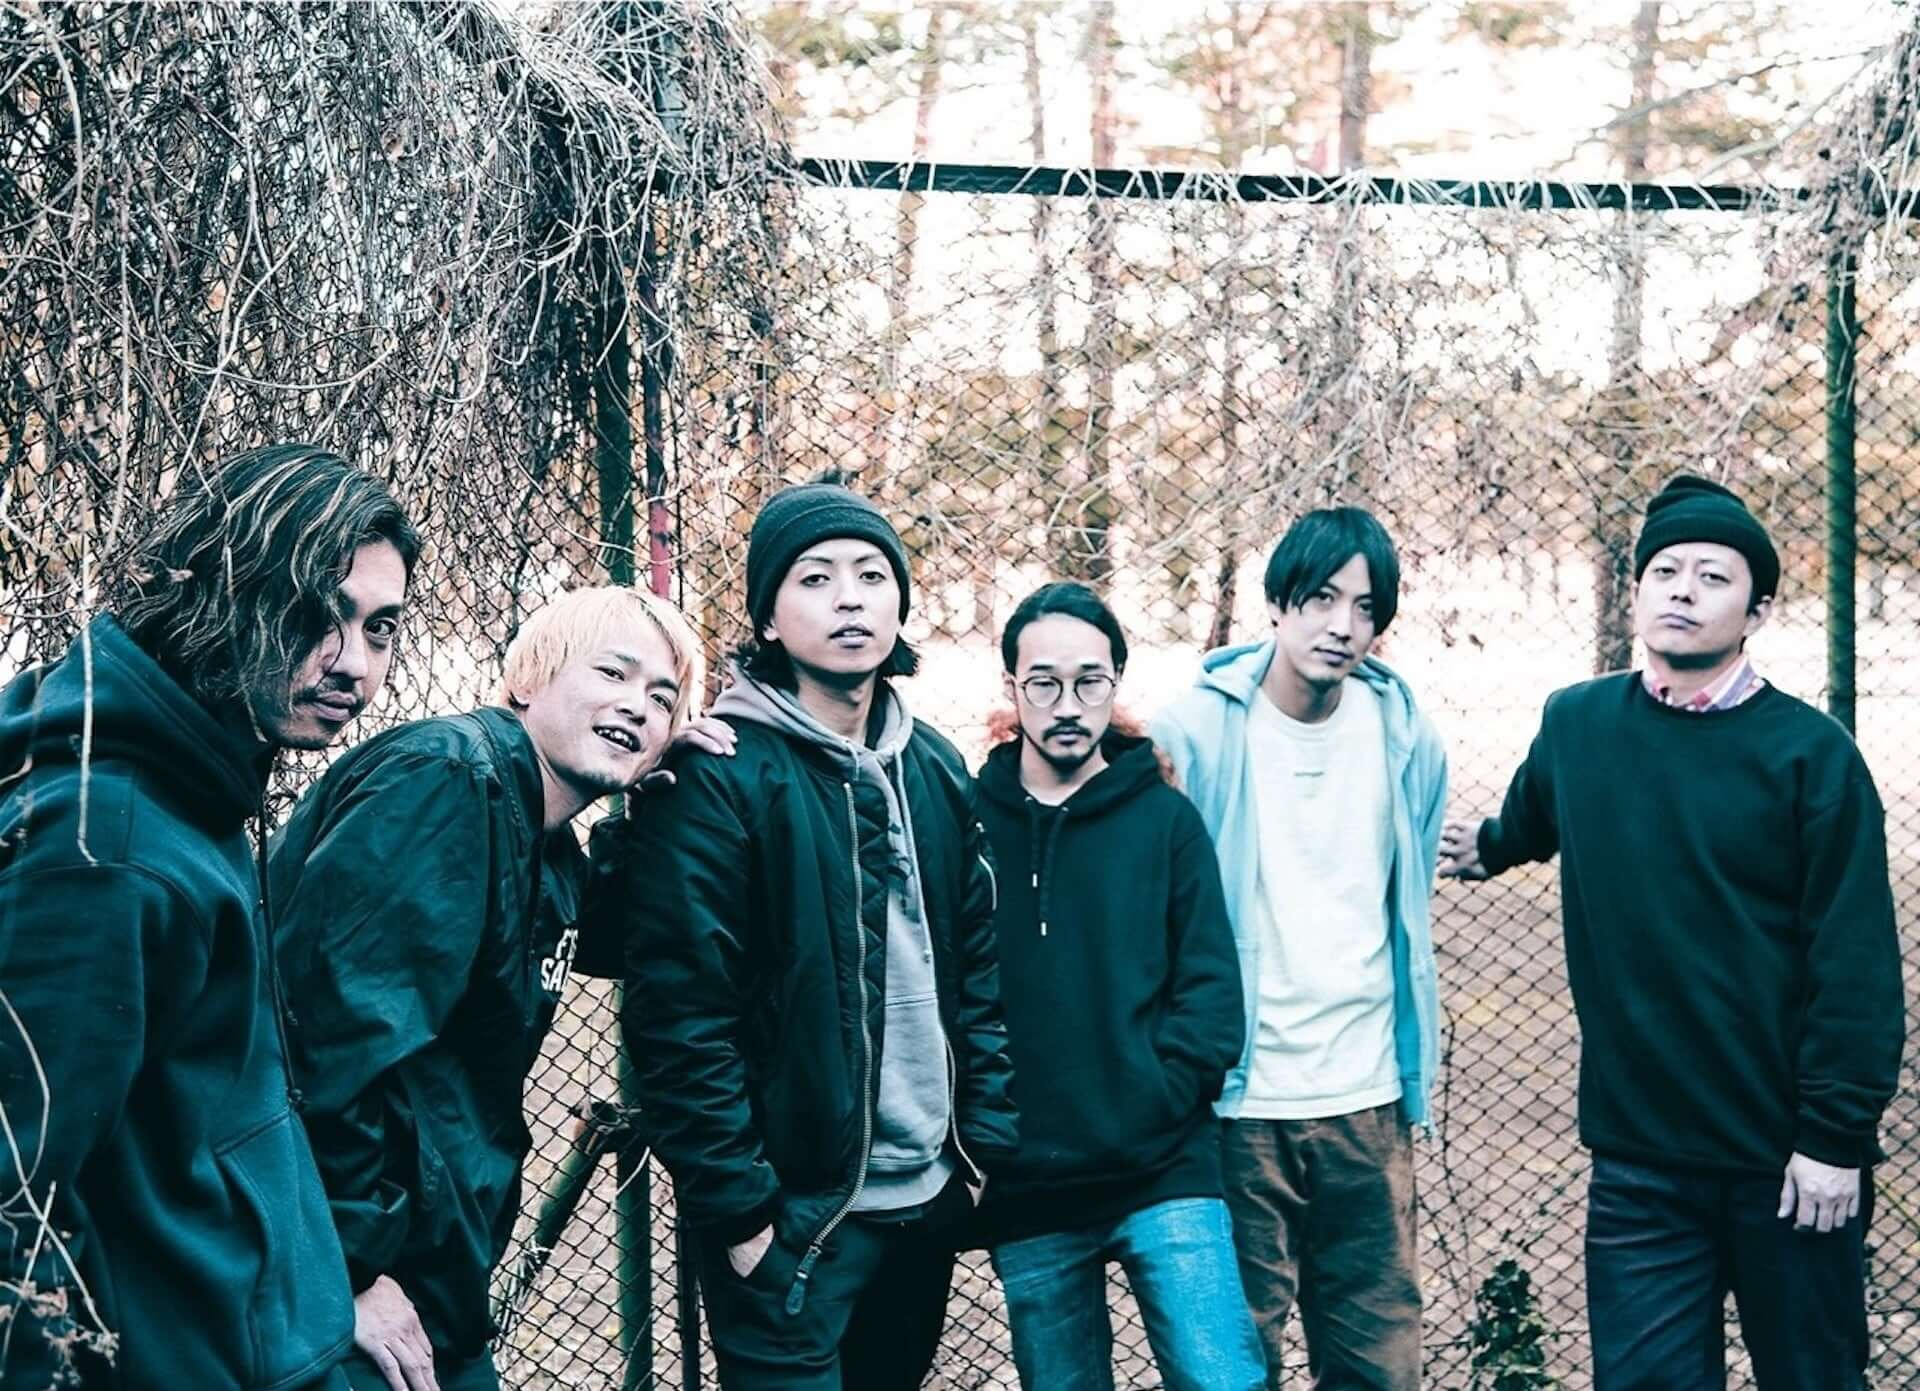 Roomiesのワンマンライブが渋谷WWWにて開催決定!新曲「In my Dream」も配信開始 music200323_roomies_www_2-1920x1391